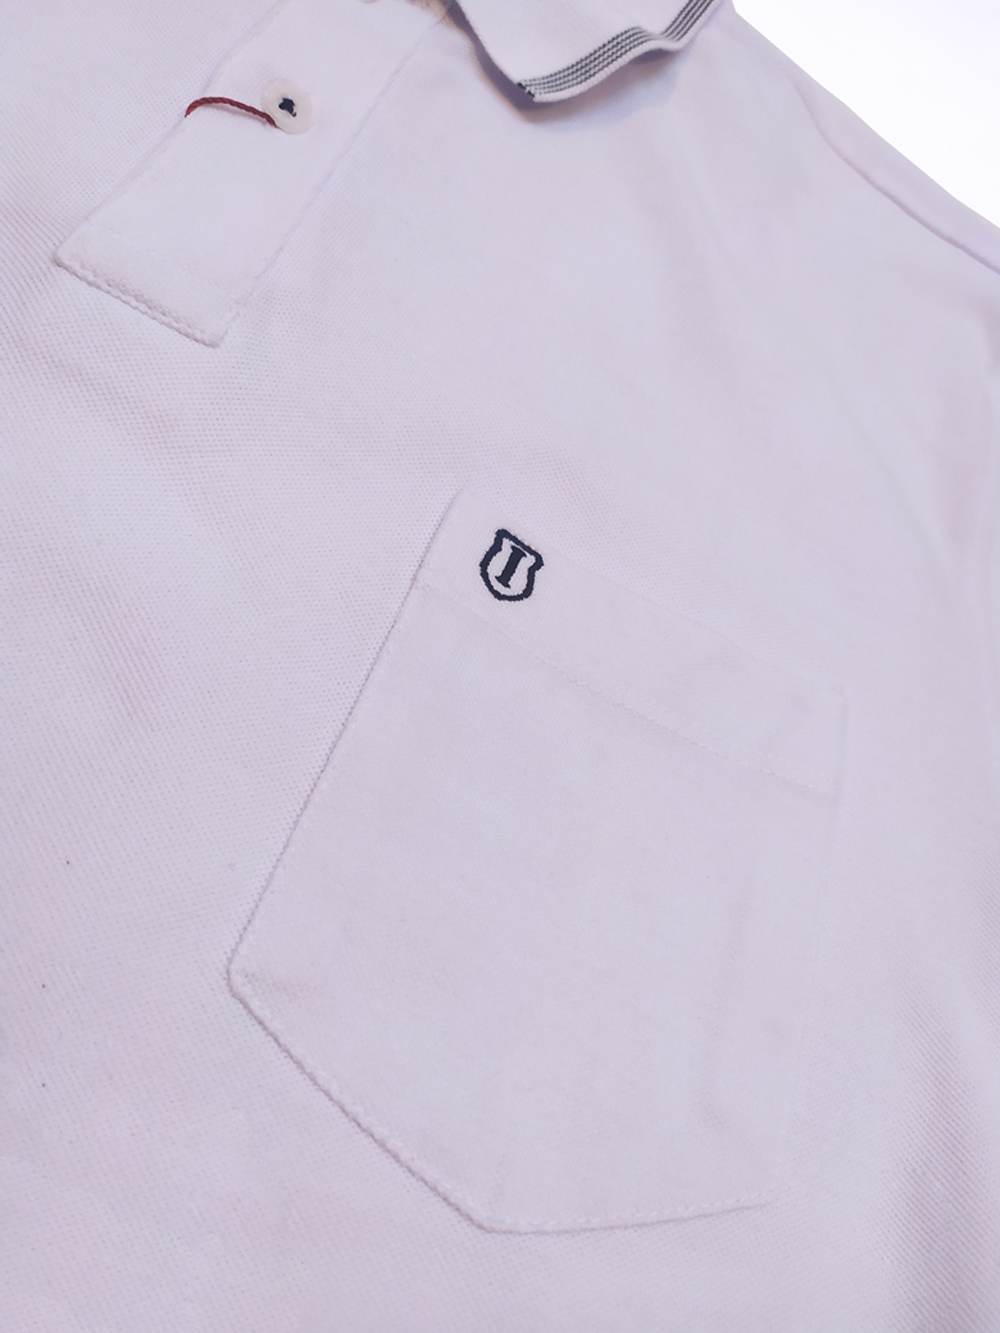 Camisa Gola Polo Masculina Básica com Bolso Individual